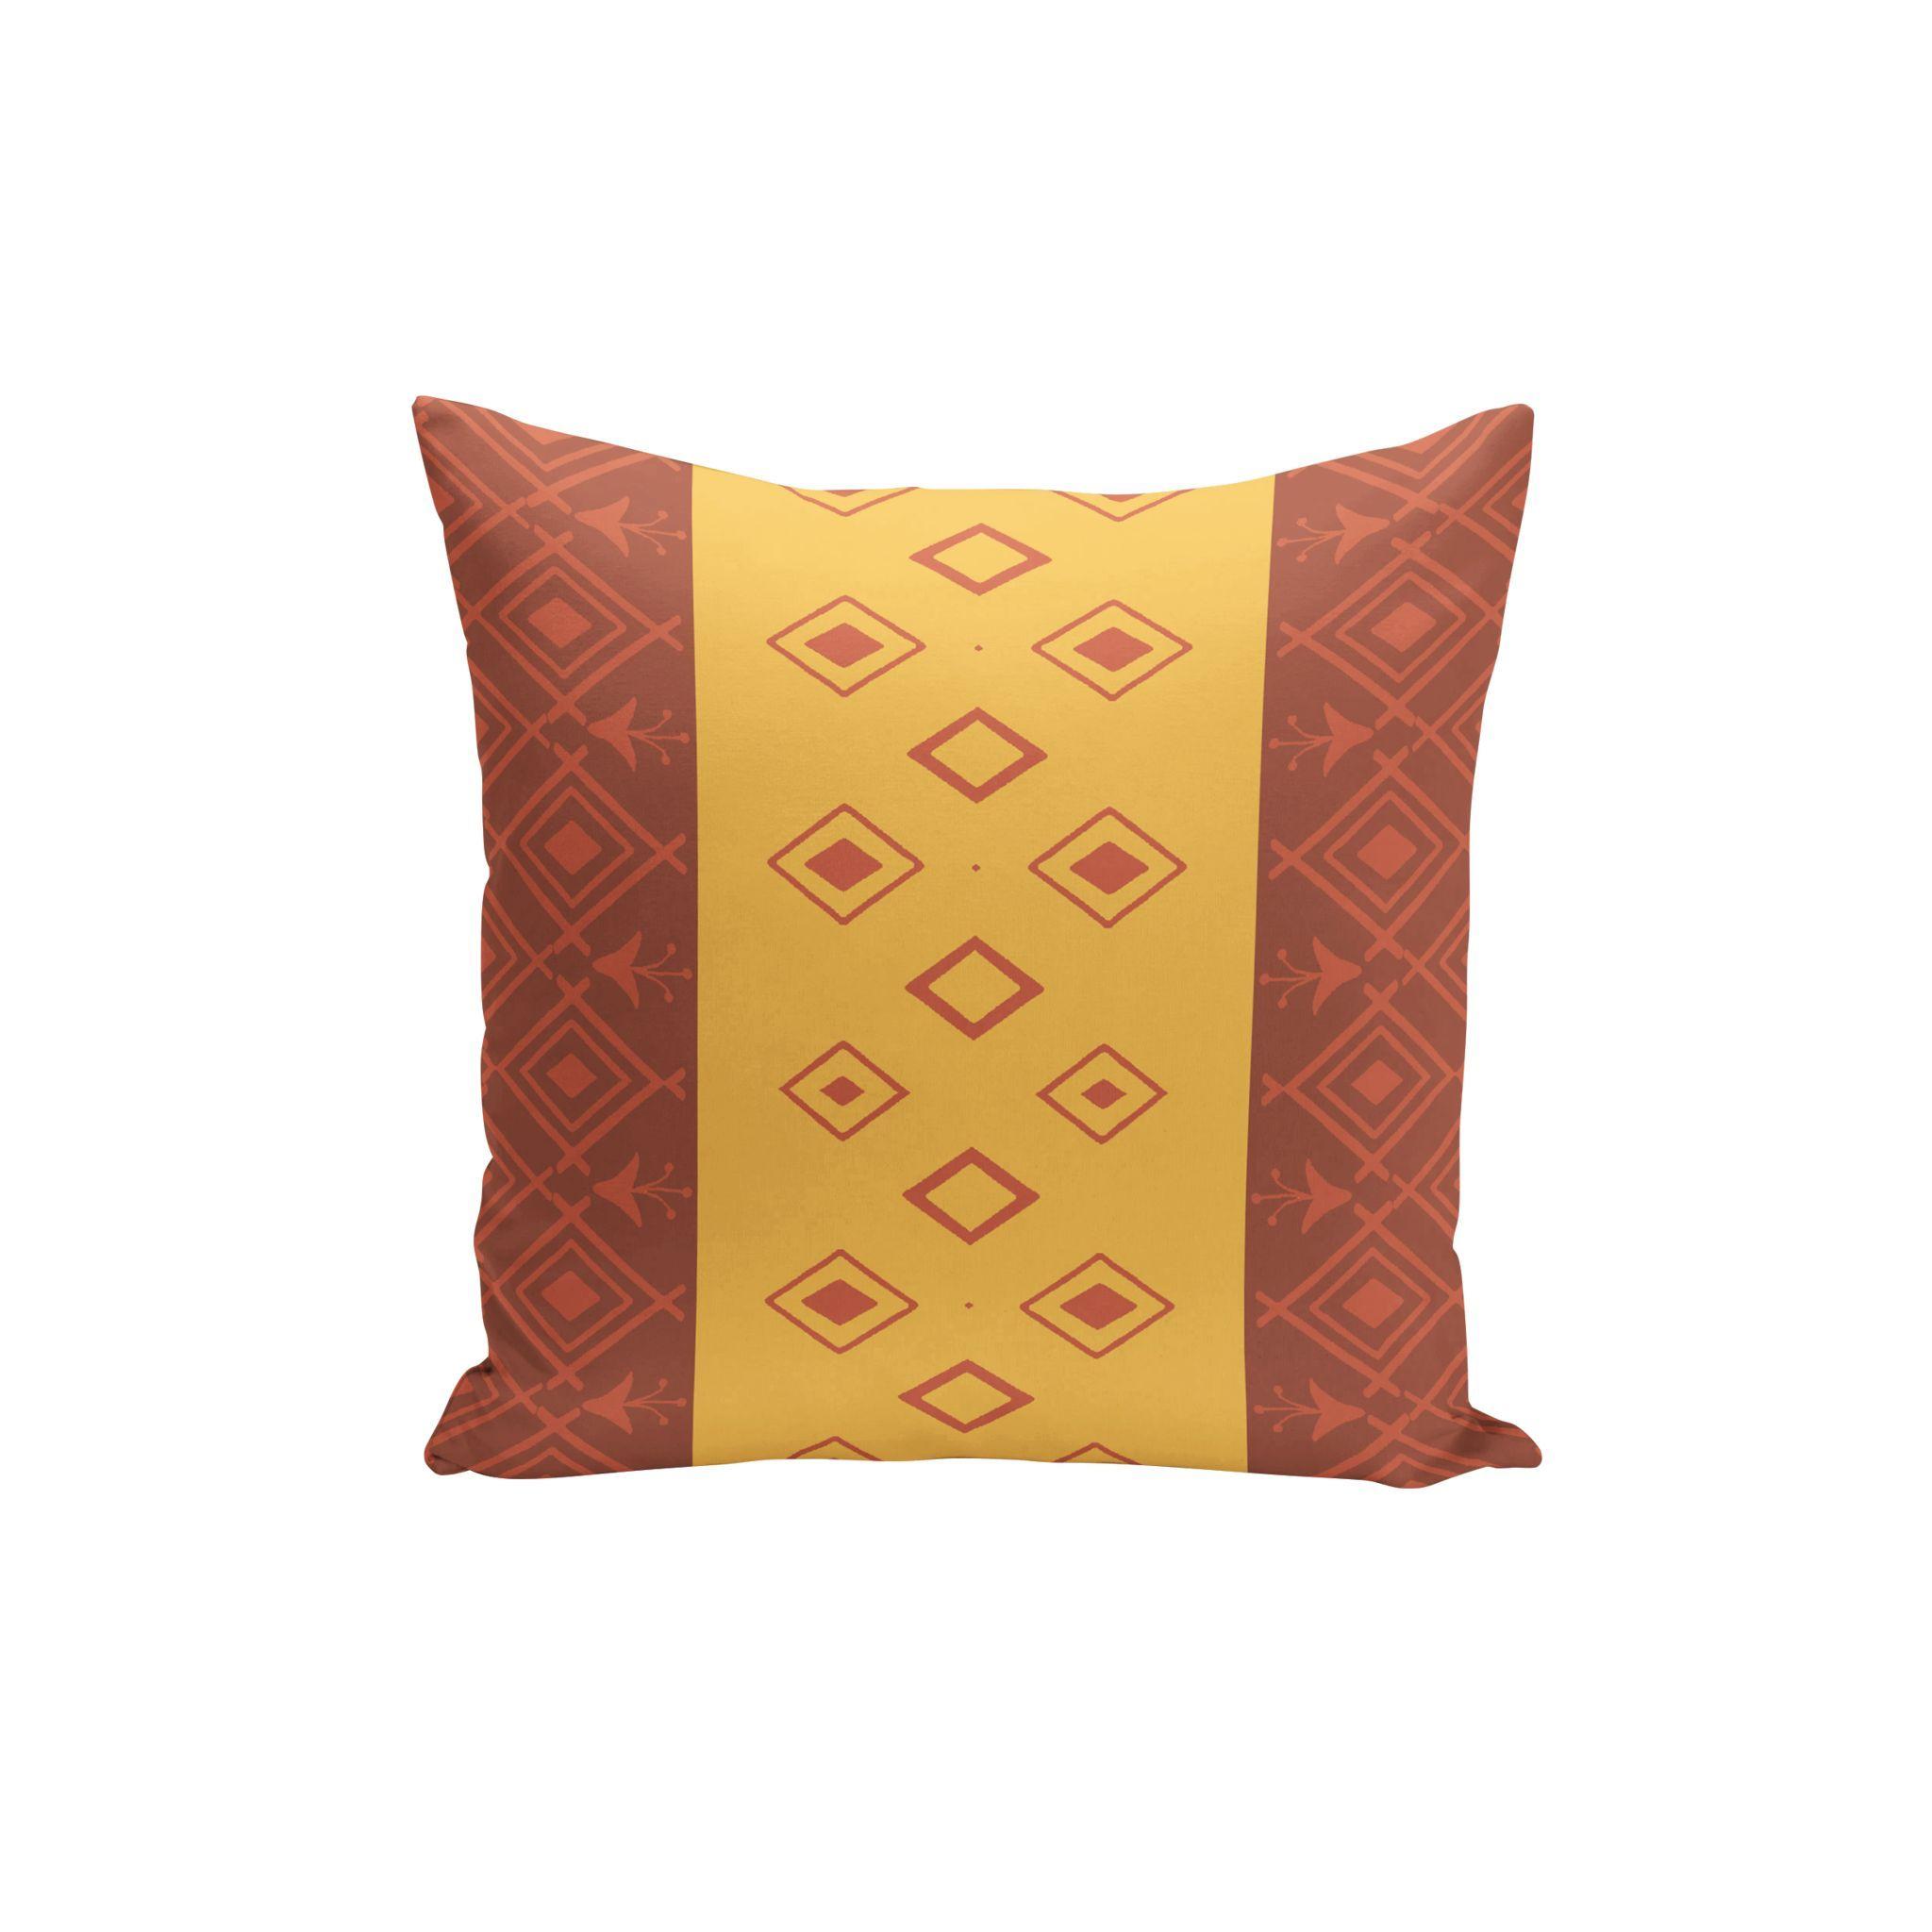 modern red orange throw pillows with decorative yellow olive green  - modern red orange throw pillows with decorative yellow olive green